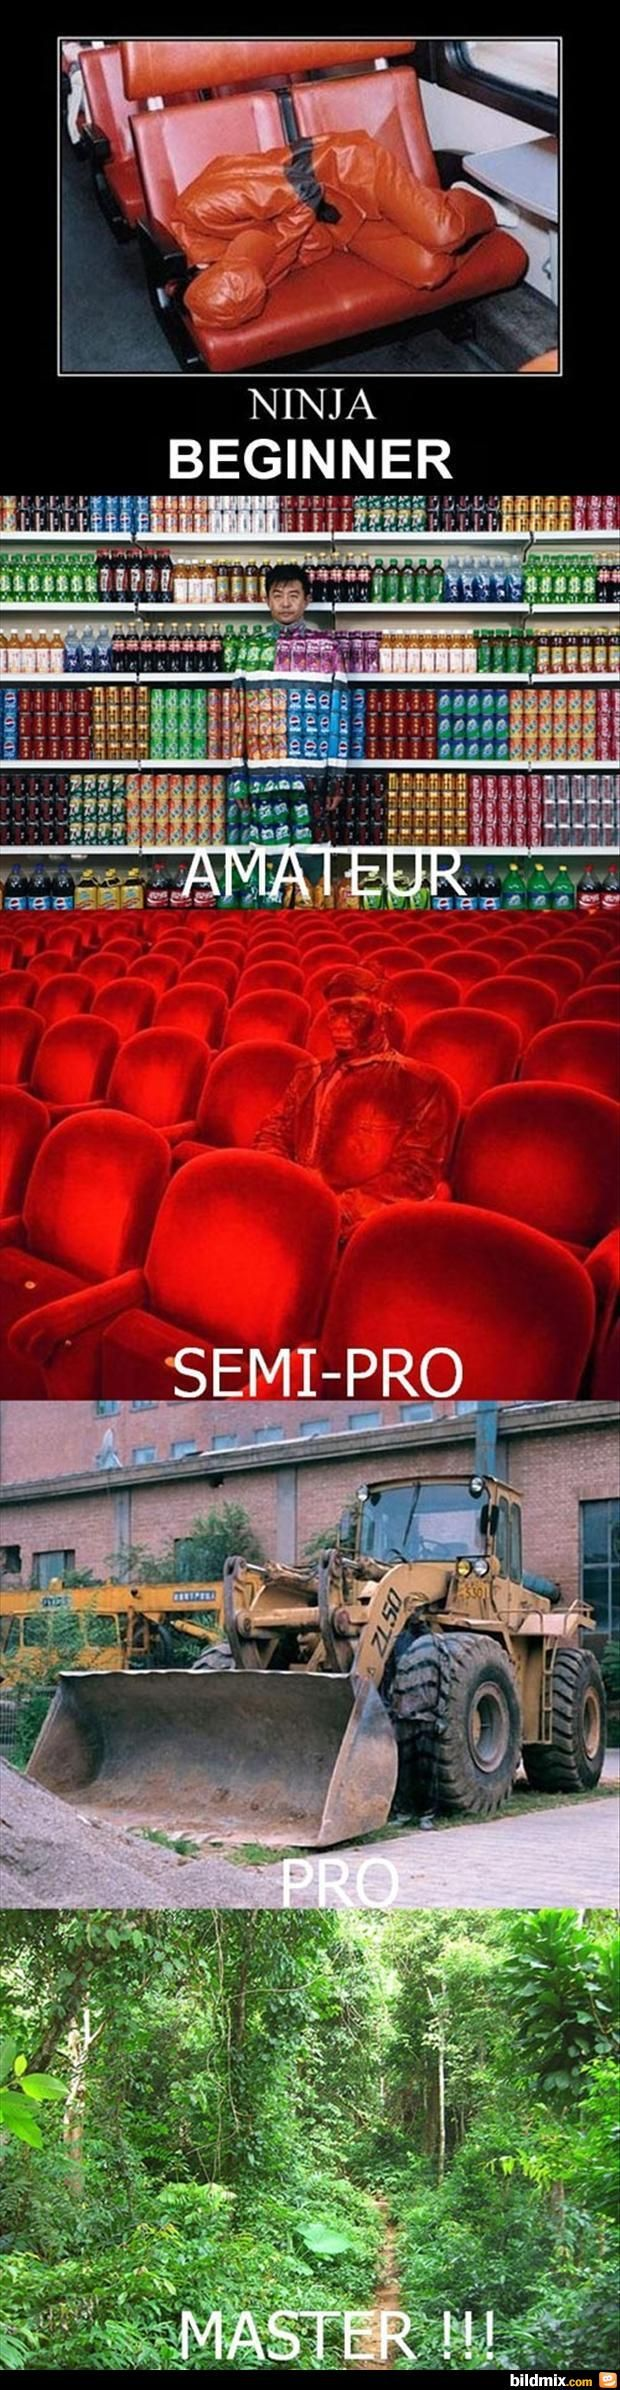 Lustiger Picdump #8 / bildmix.com - Täglich neue Picdumps!